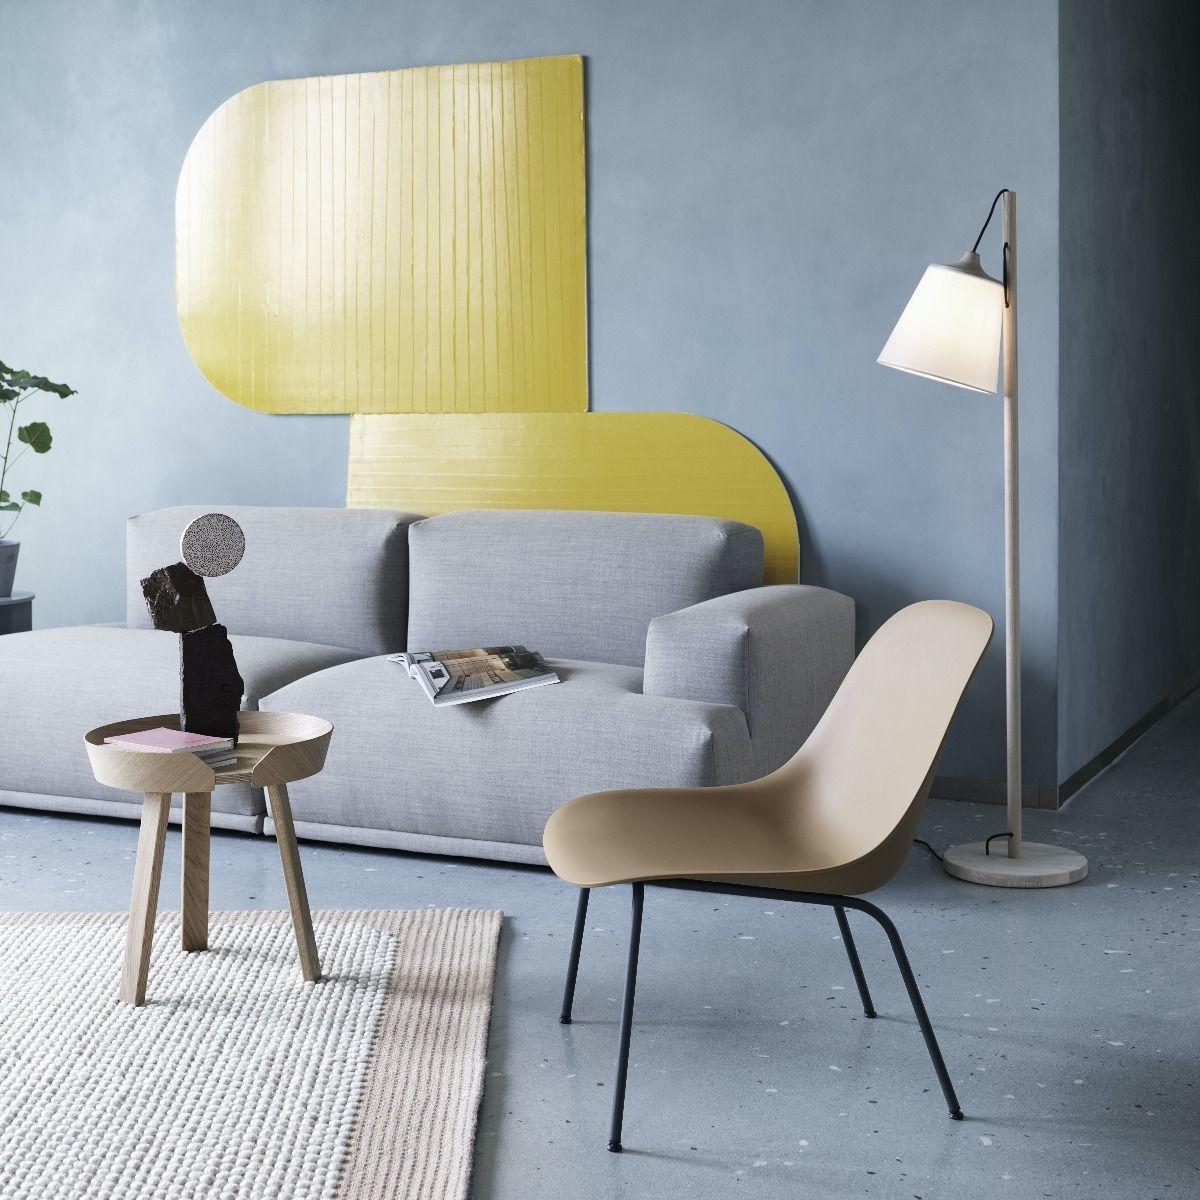 Muuto Pull Floor Lamp next to a grey sofa